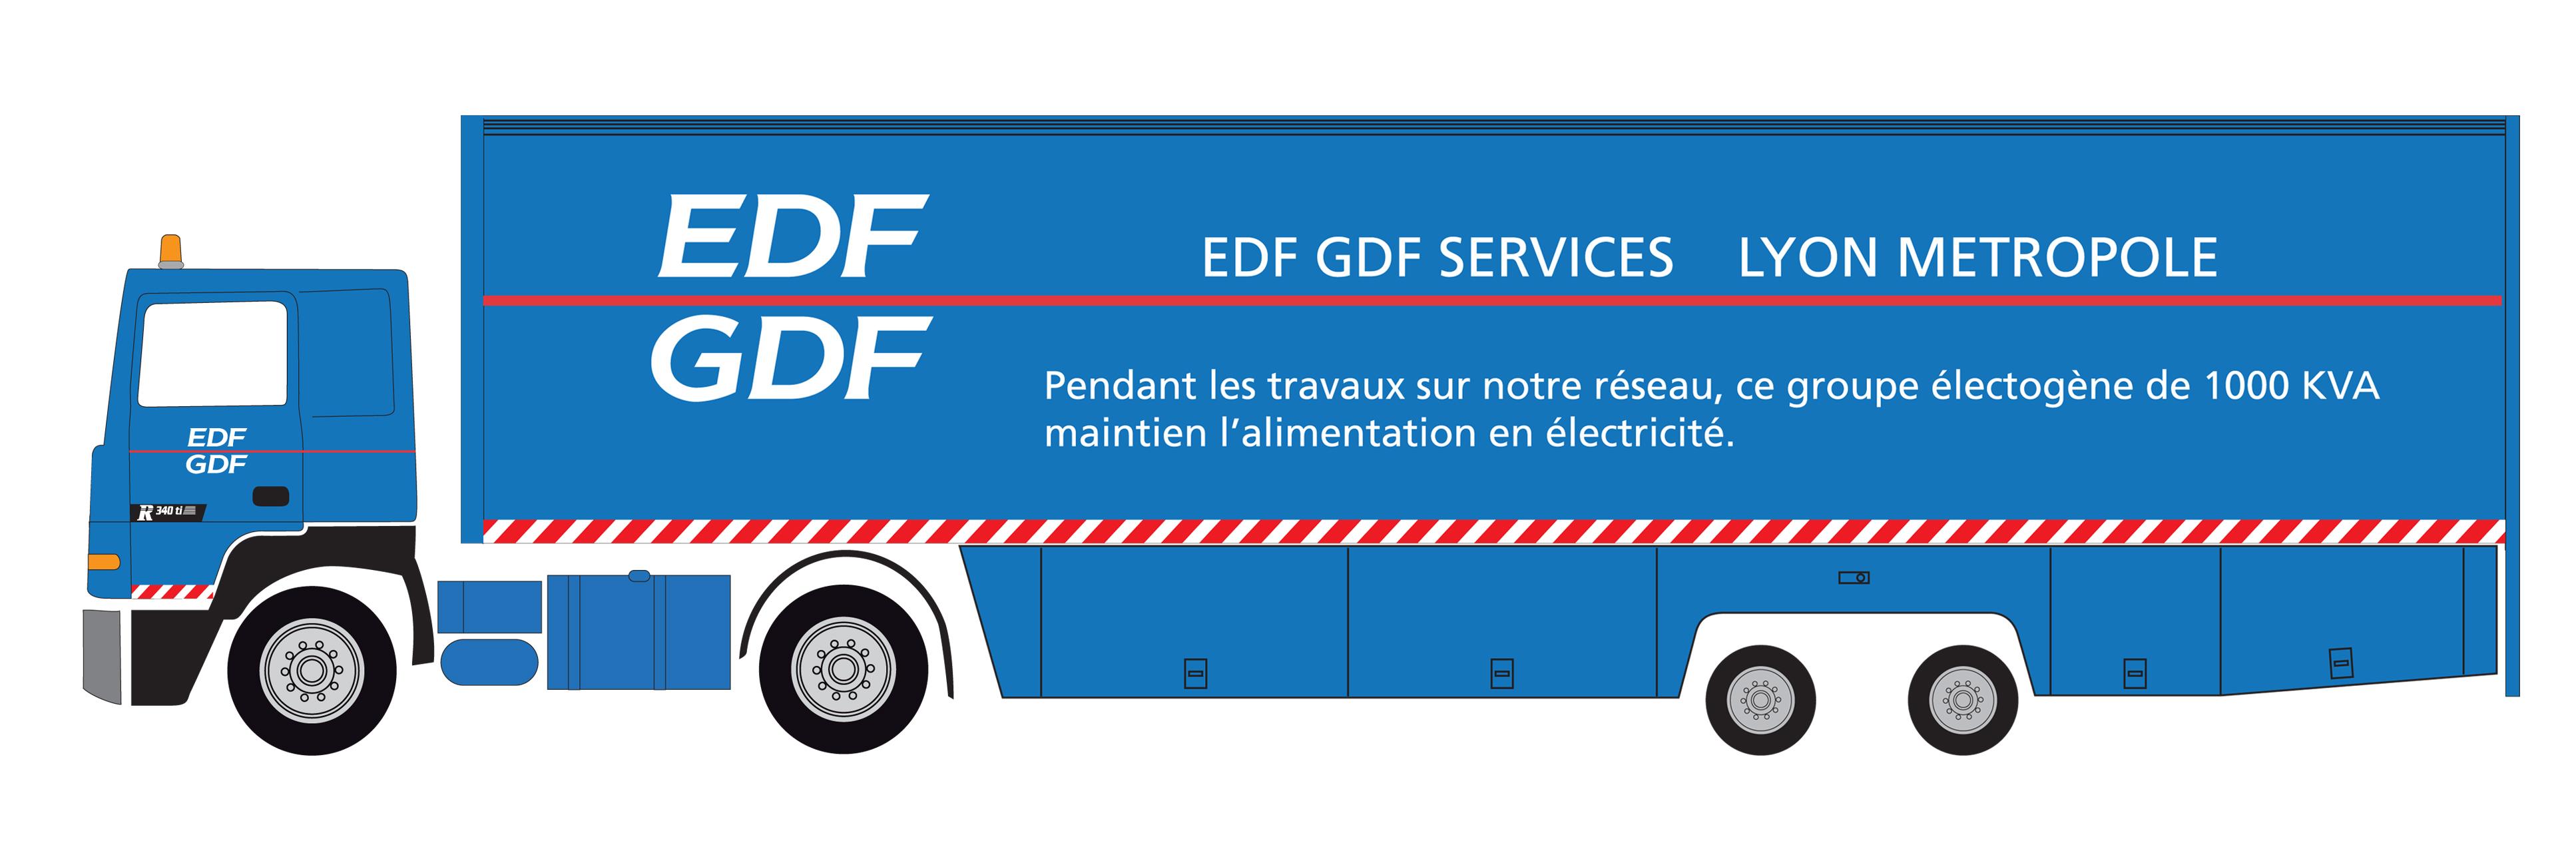 BAT RENAULT R SEMI COURSE EDF GDF 2020 MODIFIE 040320